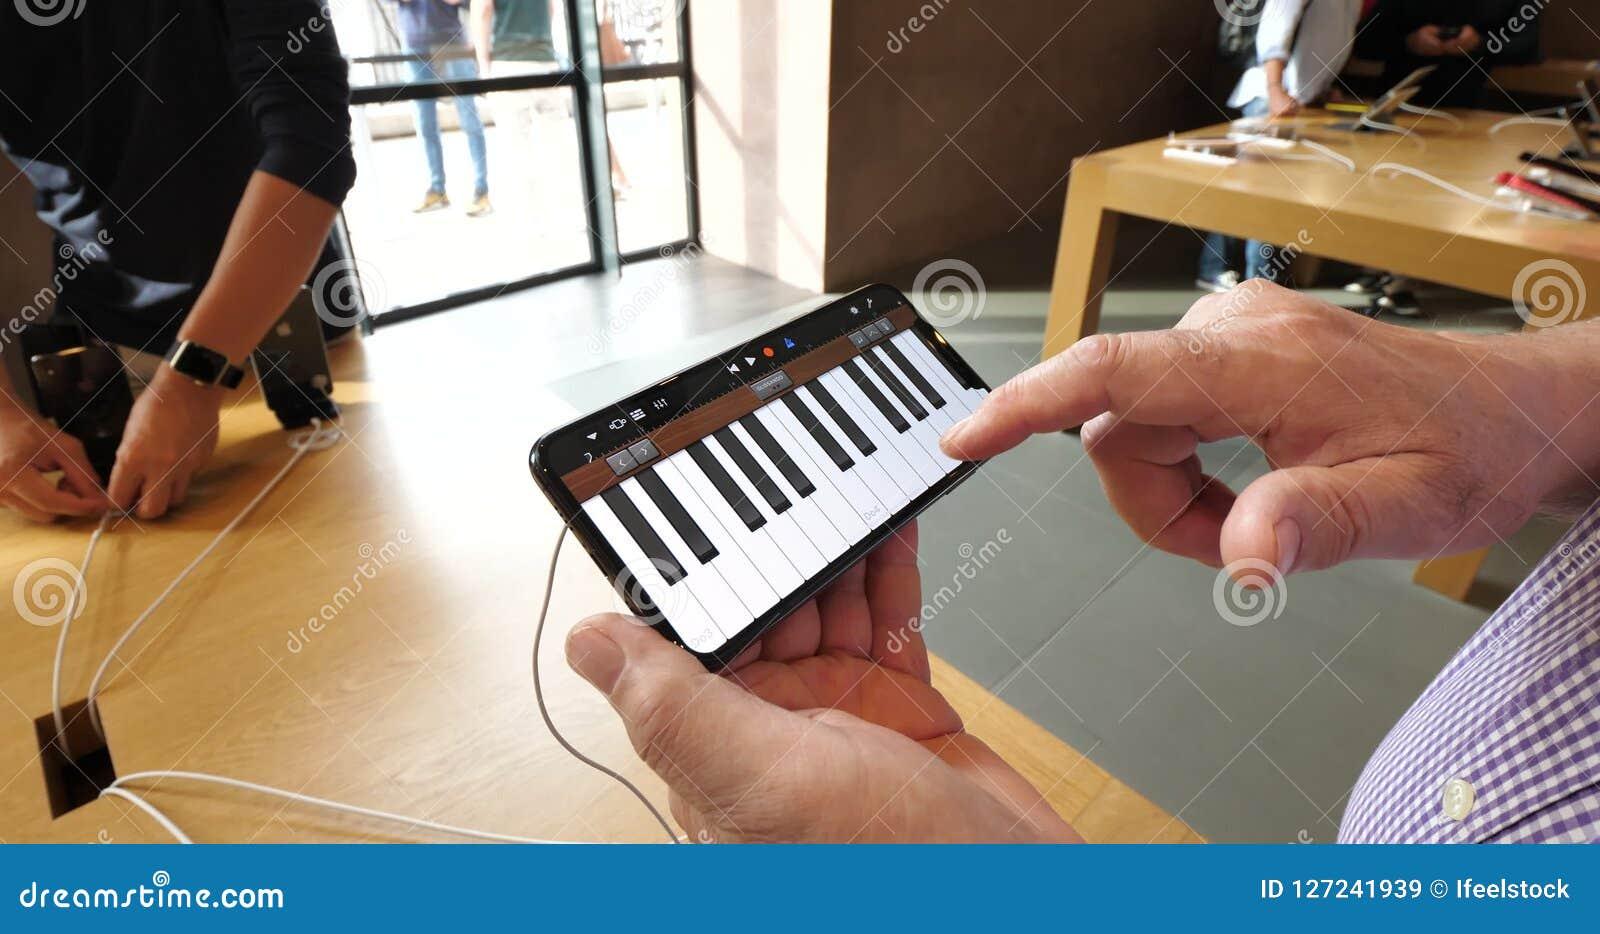 Piano Garage Band : Senior man playing piano on iphone xs max in garageband app stock